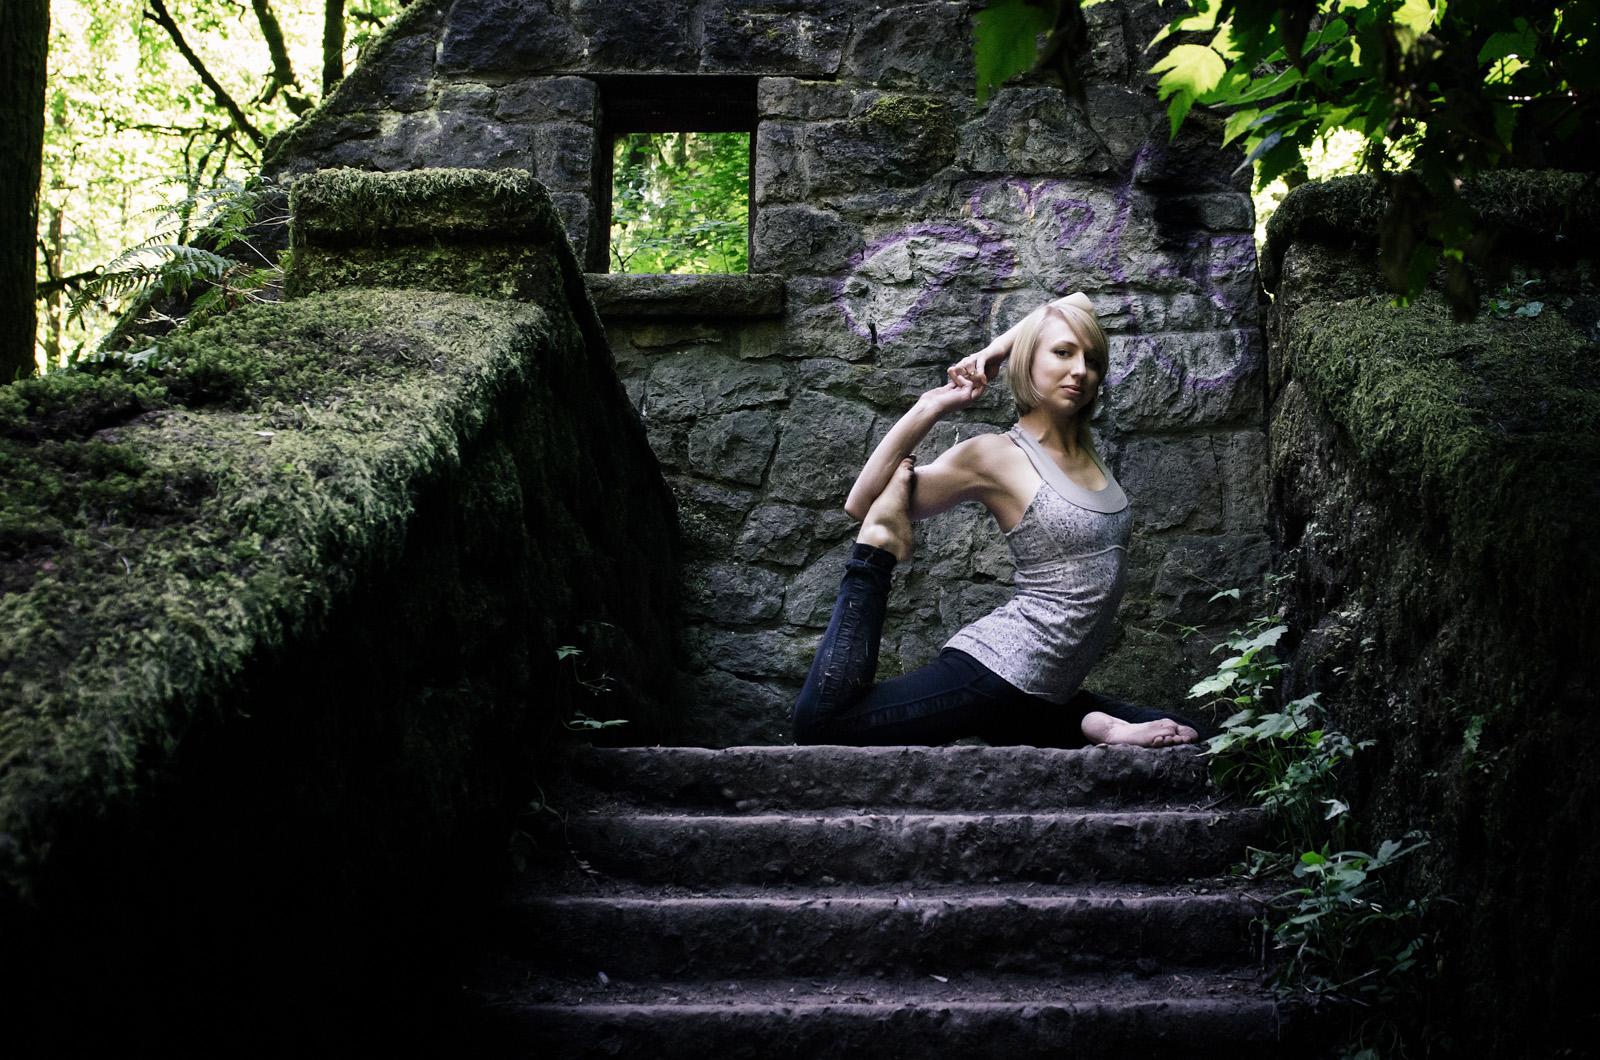 Yoga-GalenFairbanks-AmyRolloPhoto-4.jpeg